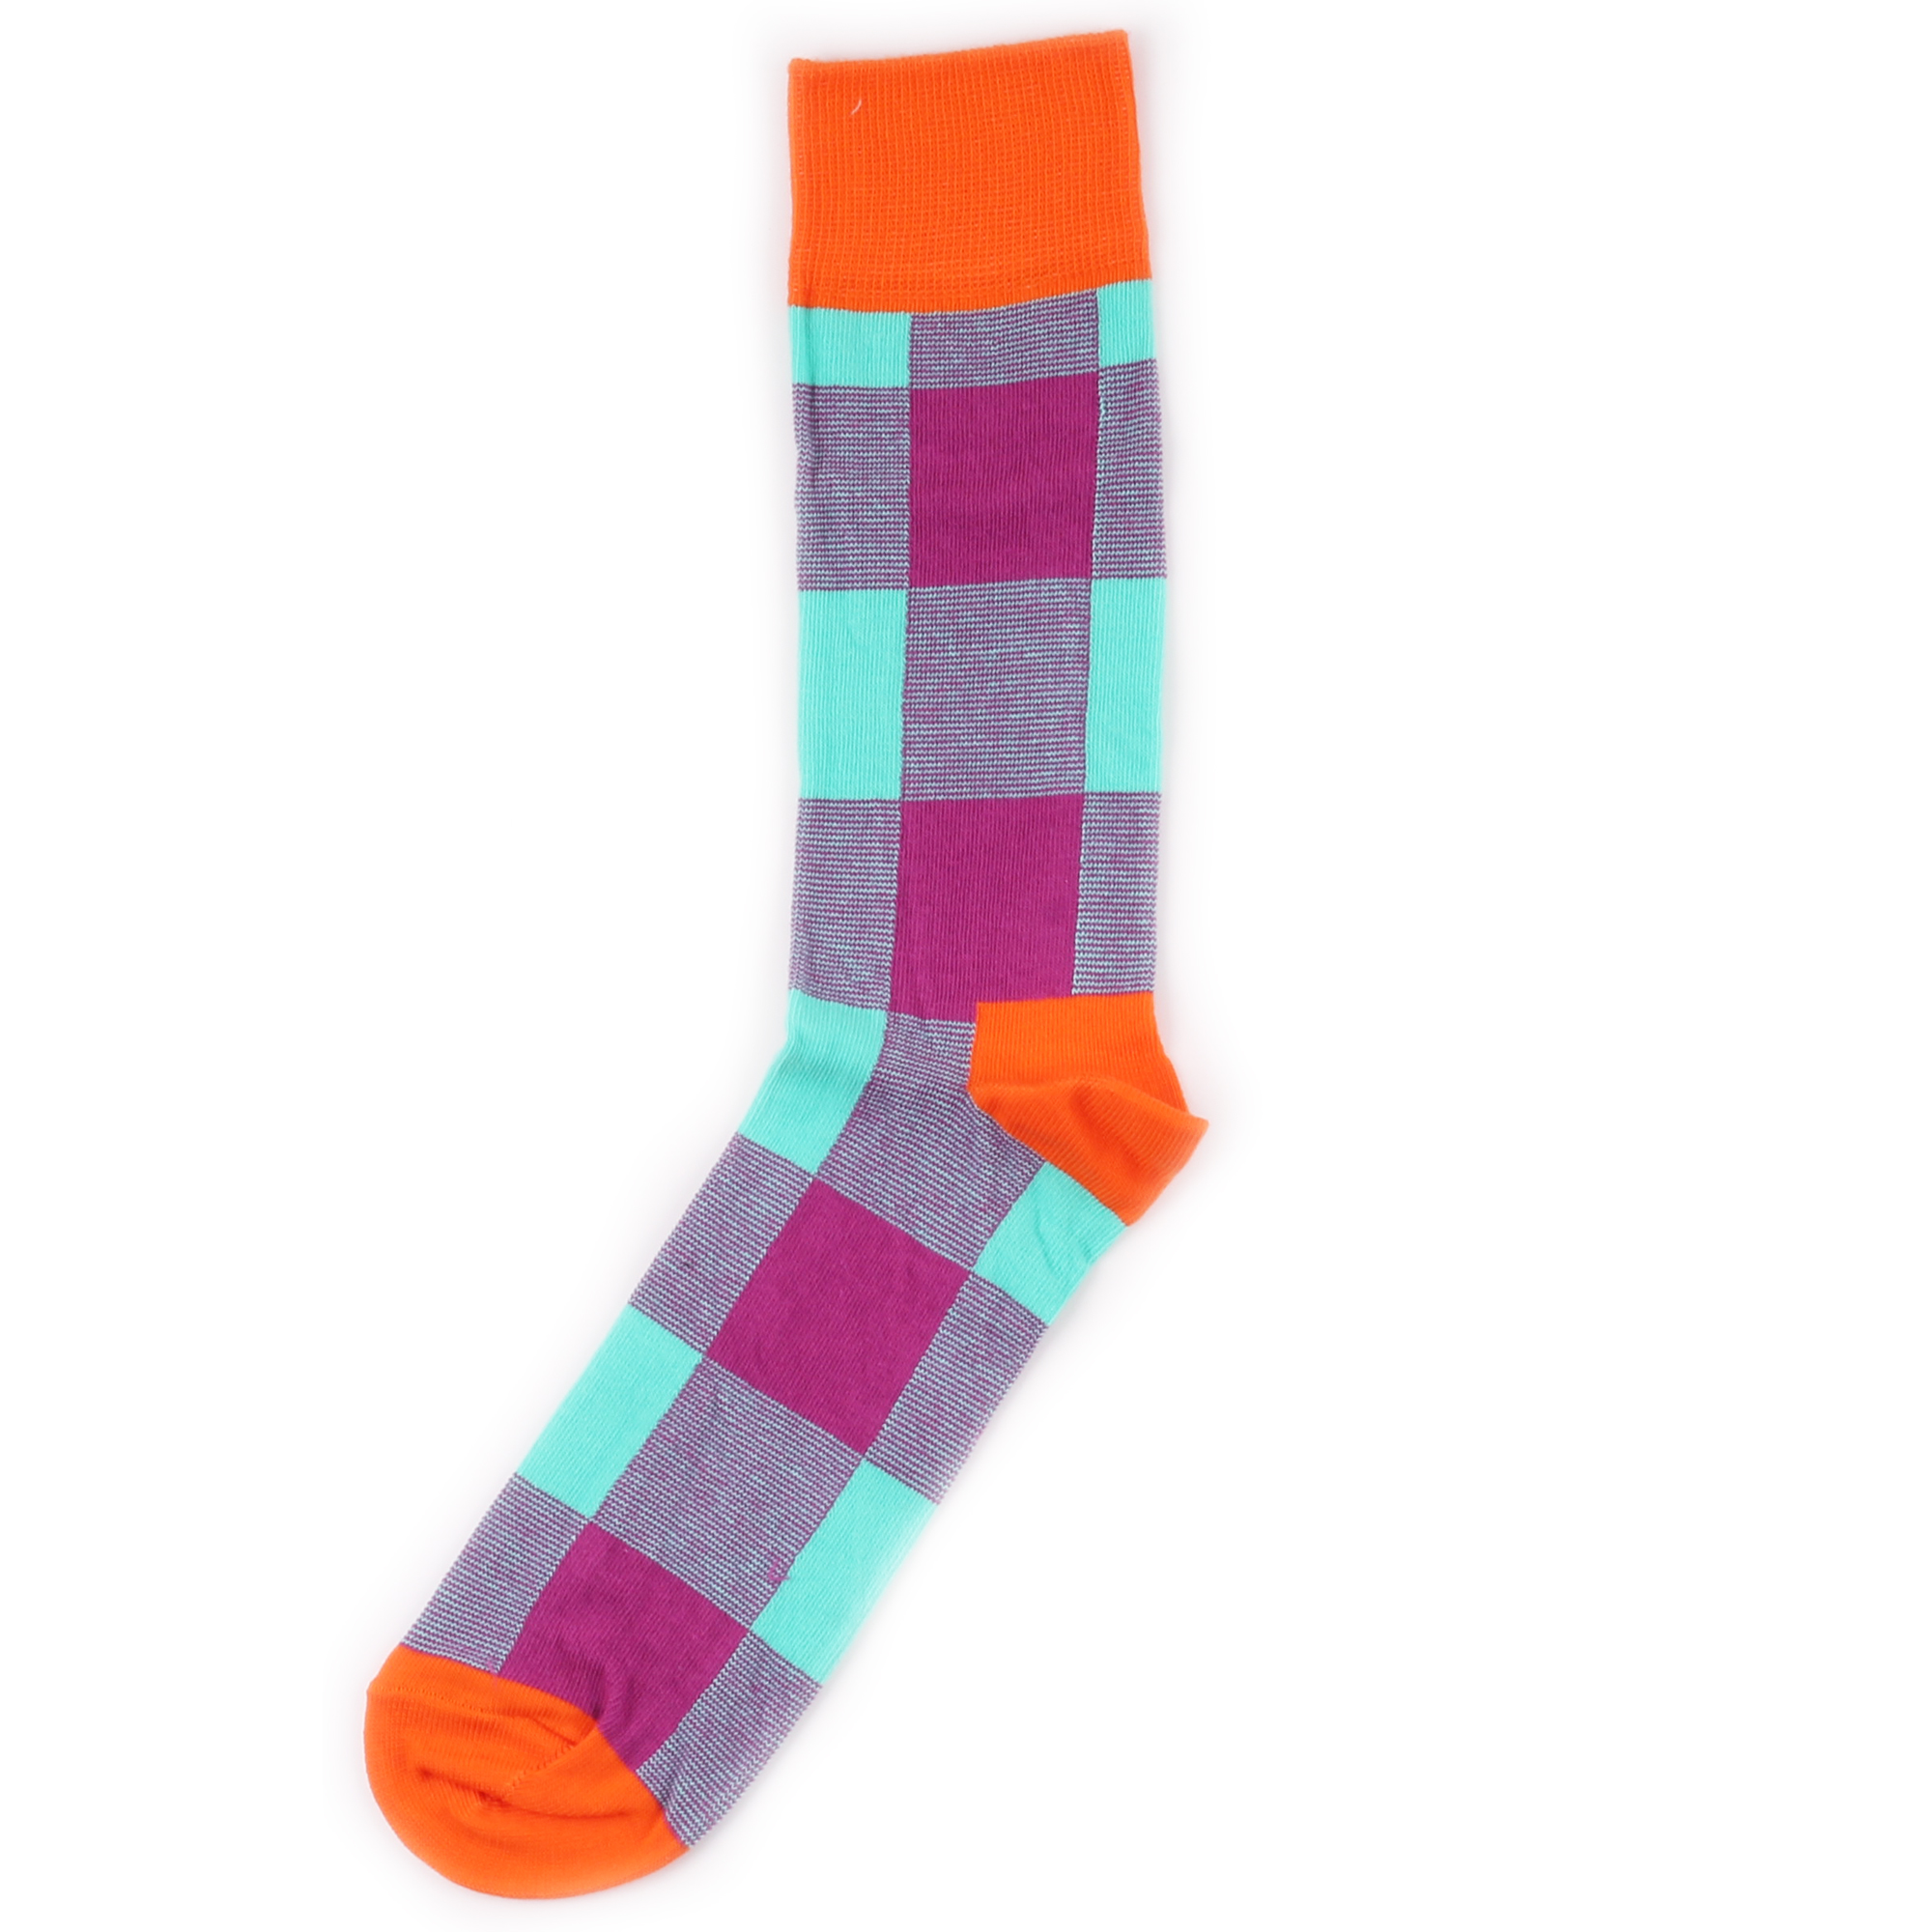 Носки унисекс Happy Socks Happy Socks Lumberjack - Pink разноцветные 36-40